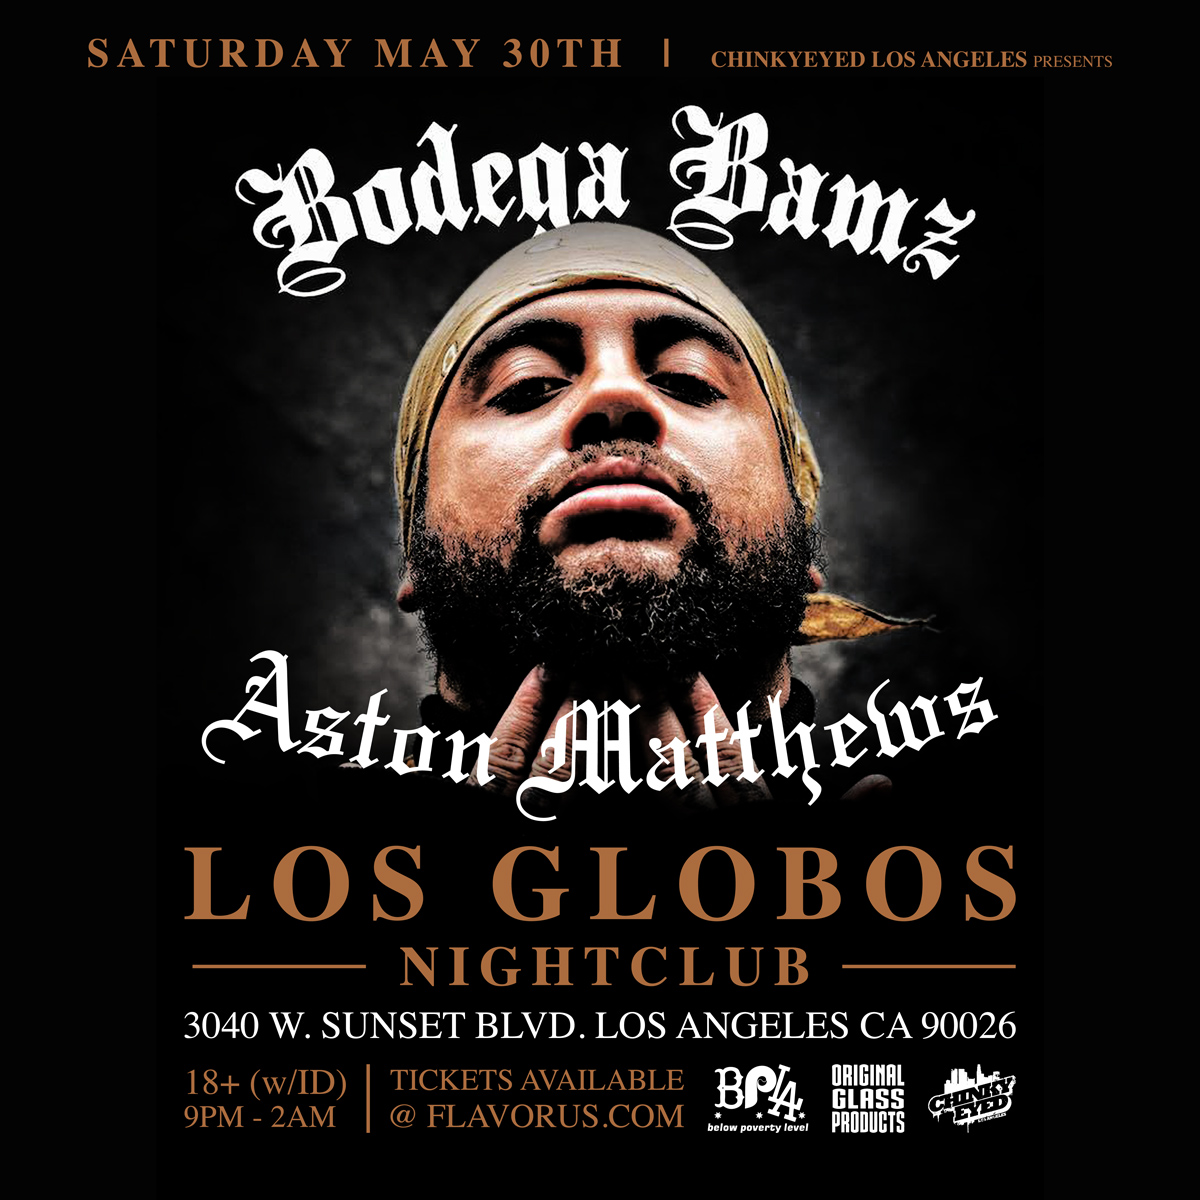 Bodega Bamz x A$ton Matthews x DrainTheGod x 3rd Ave LIVE! 5/30